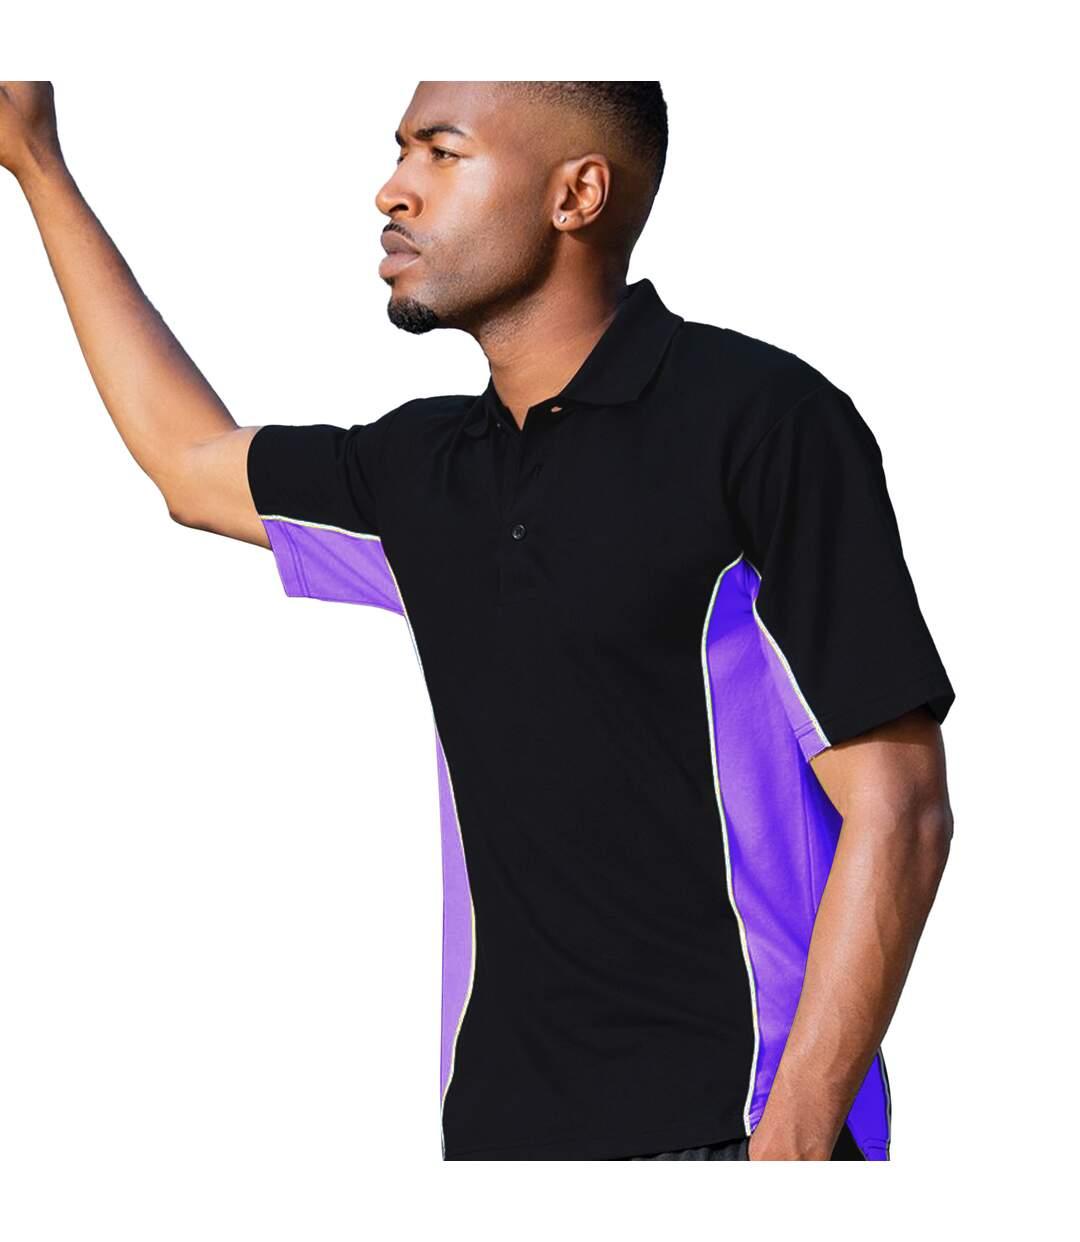 Gamegear® Mens Track Pique Short Sleeve Polo Shirt Top (Black/Royal/White) - UTBC412